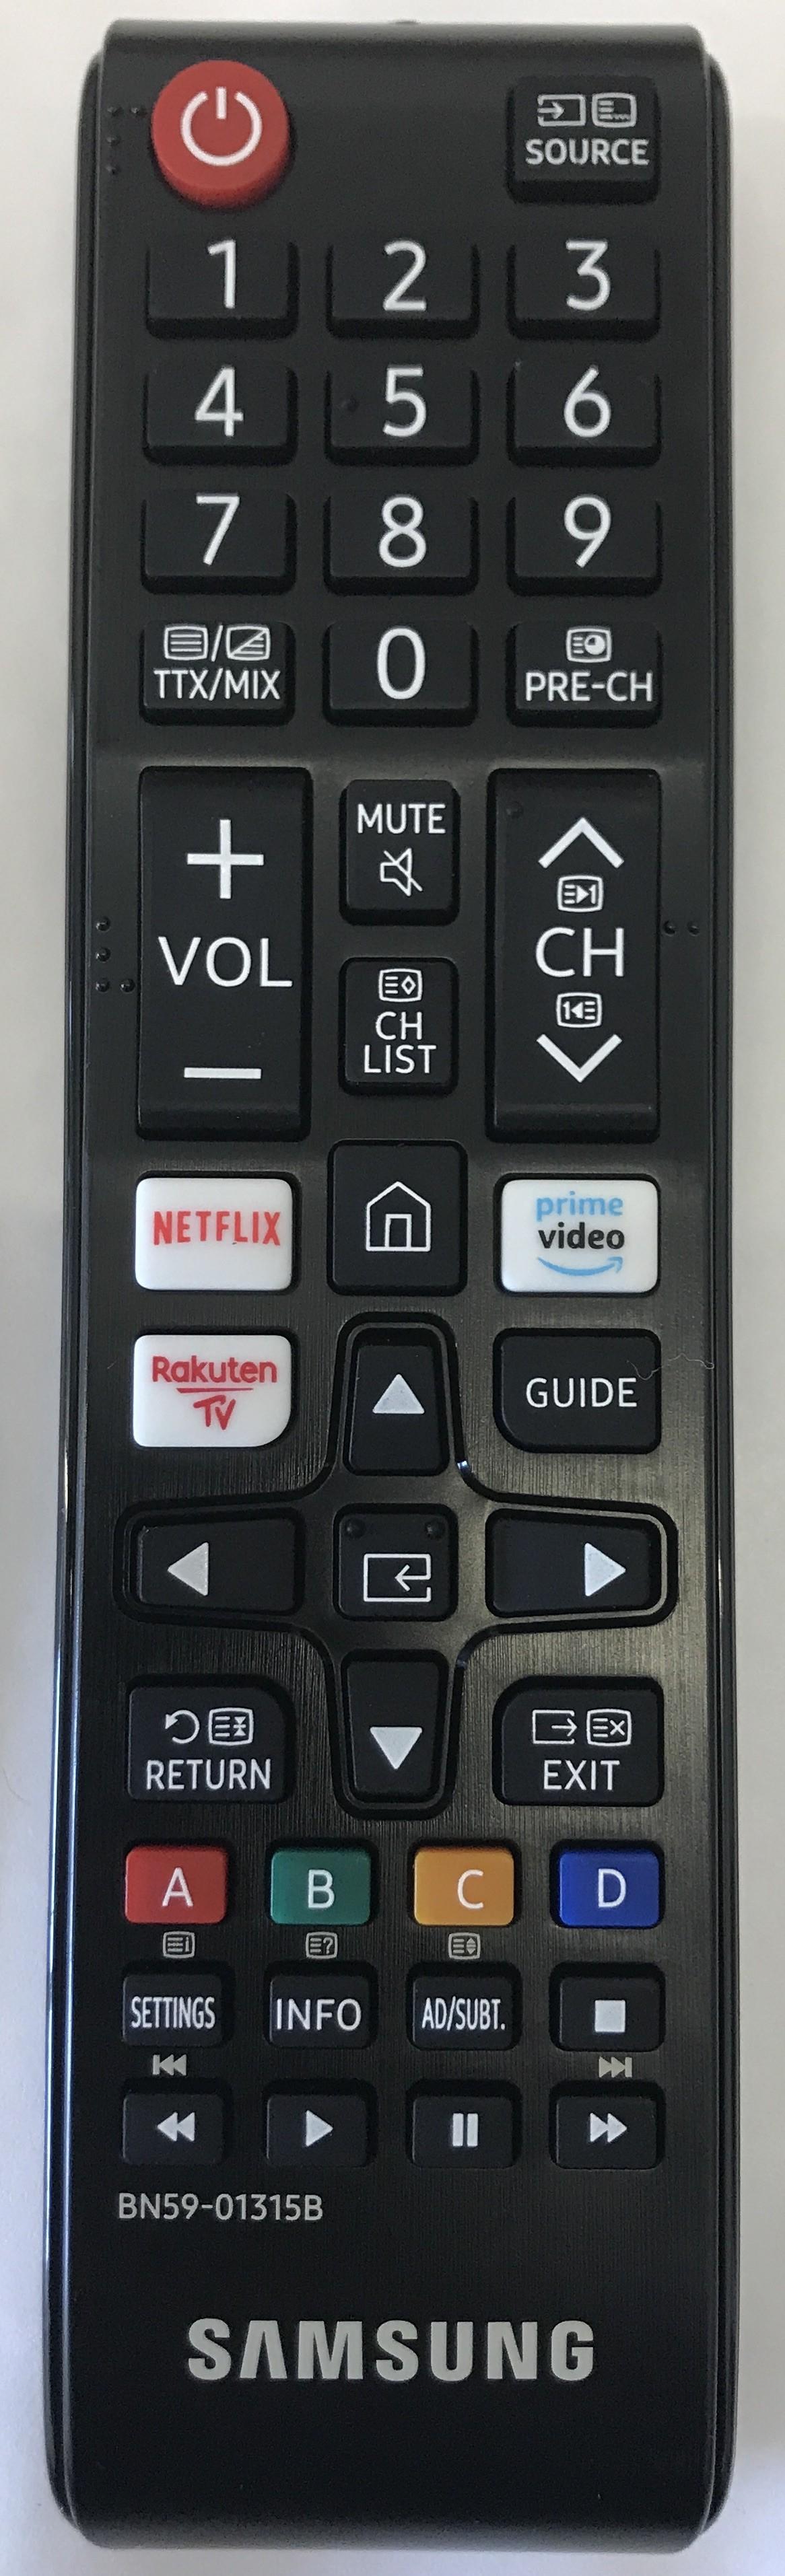 SAMSUNG BN59-01315B Remote Control Original